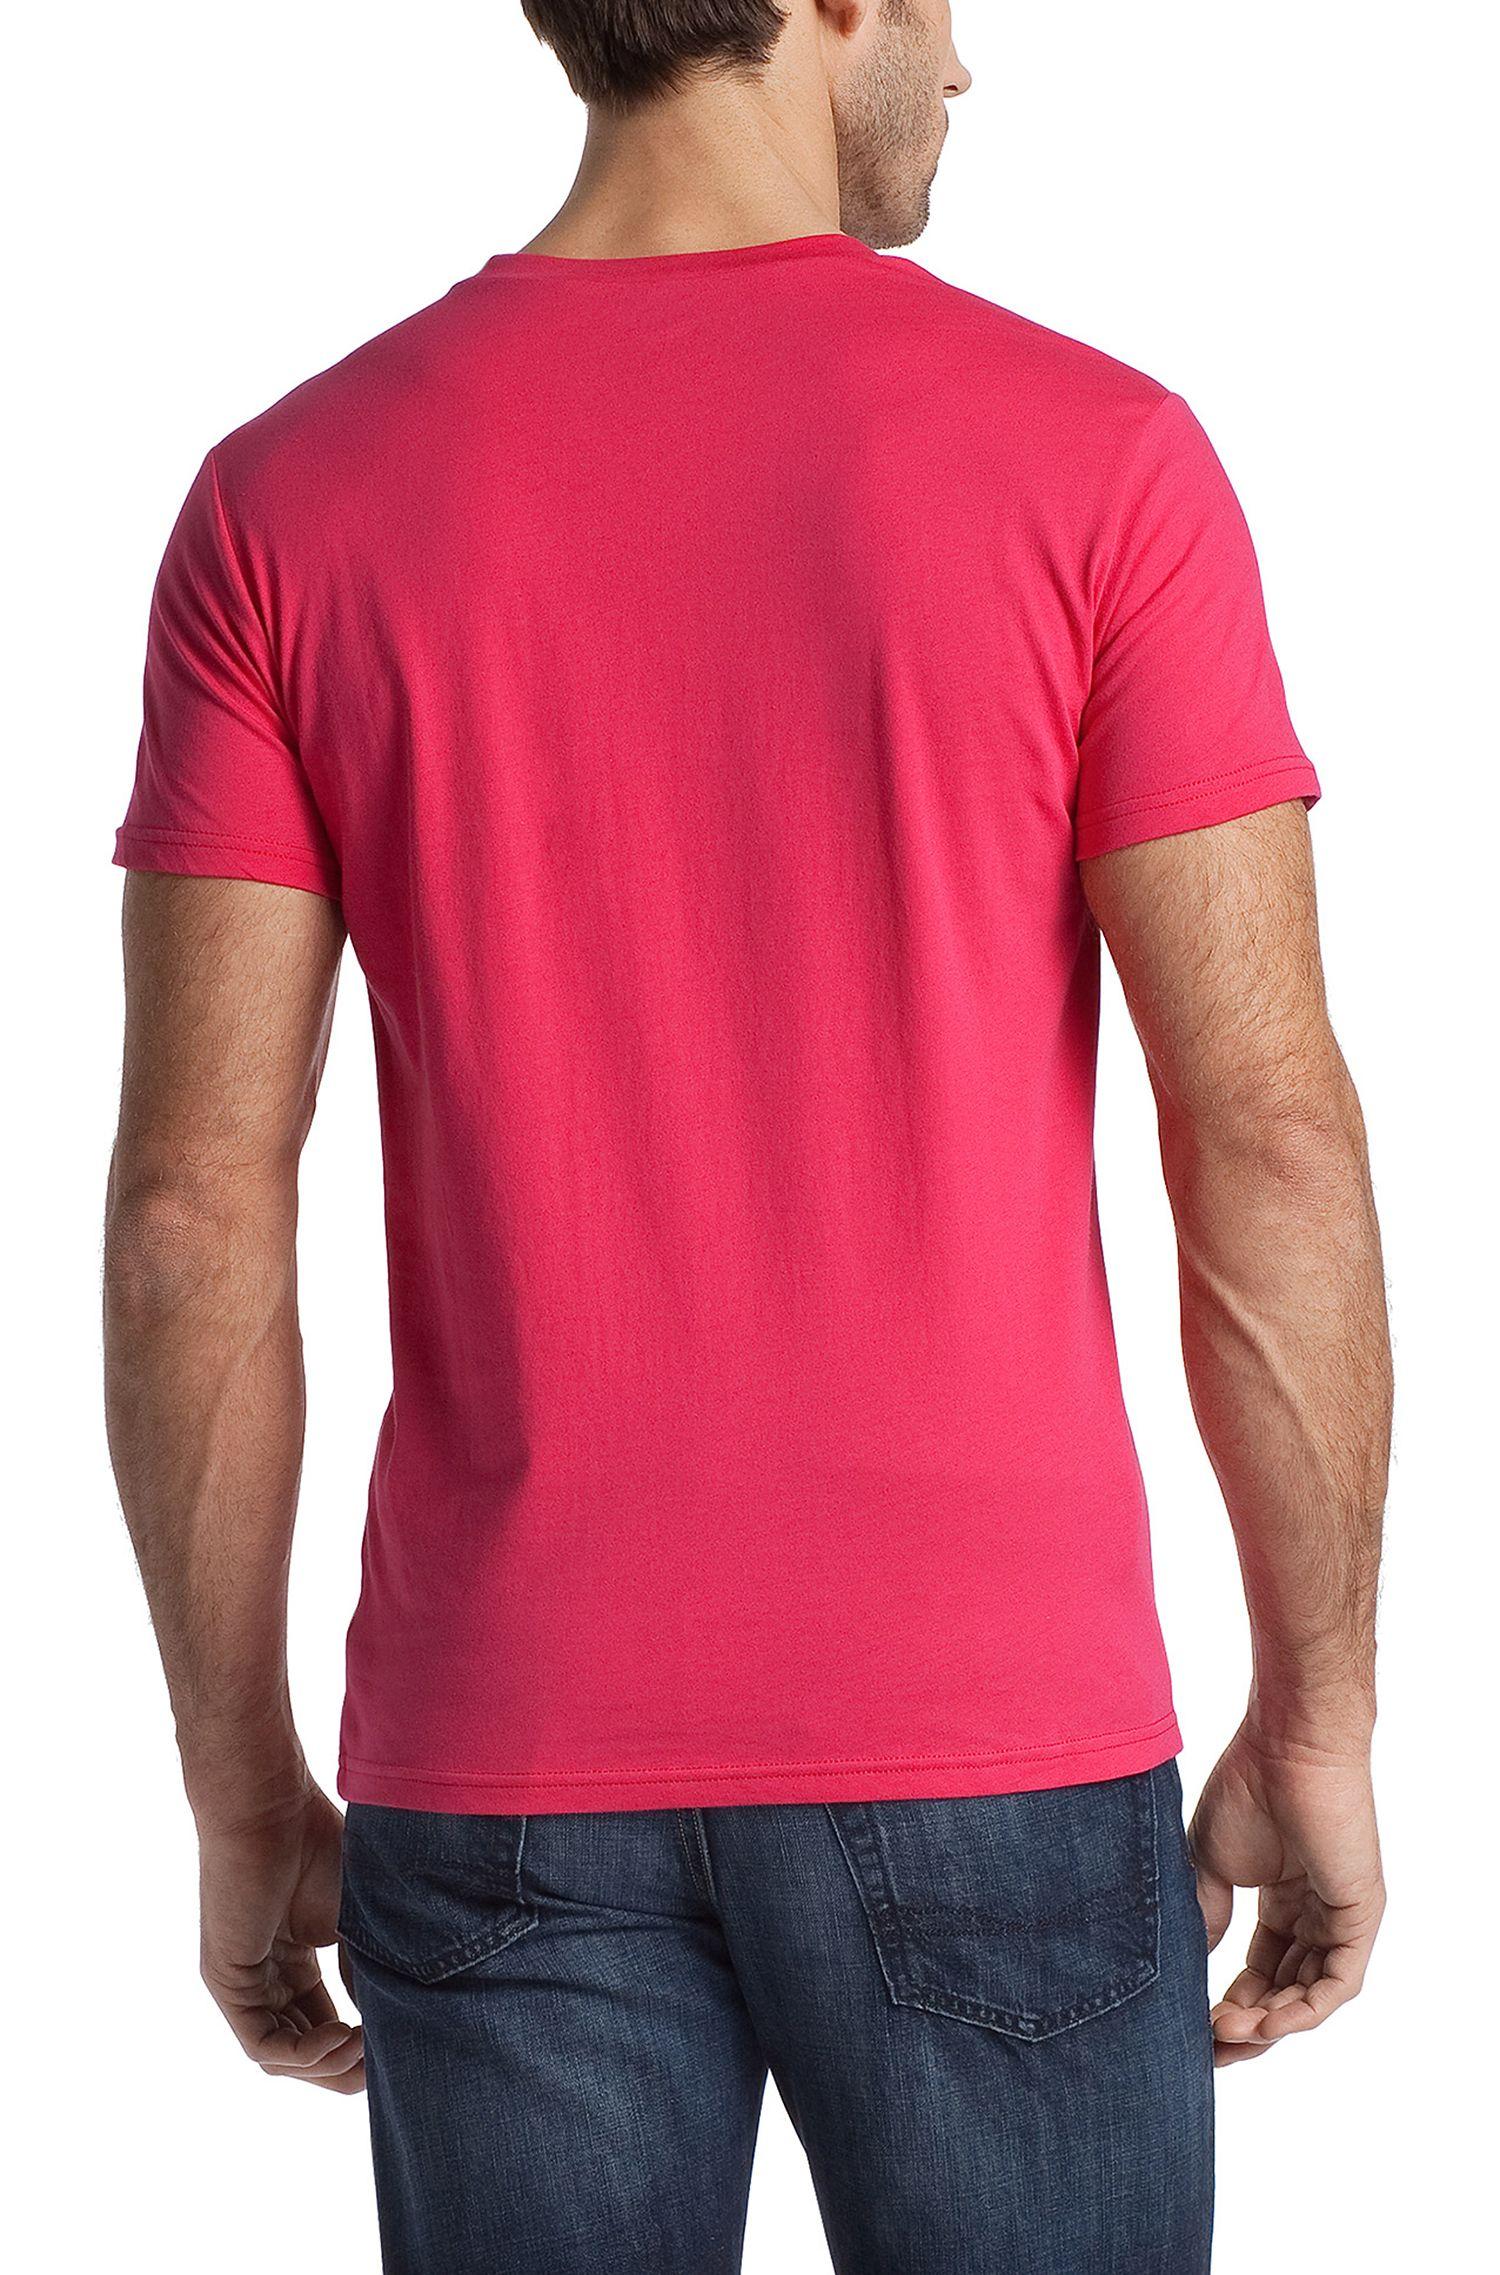 T-Shirt ´Shirt SS RN BM` mit UV-Schutz